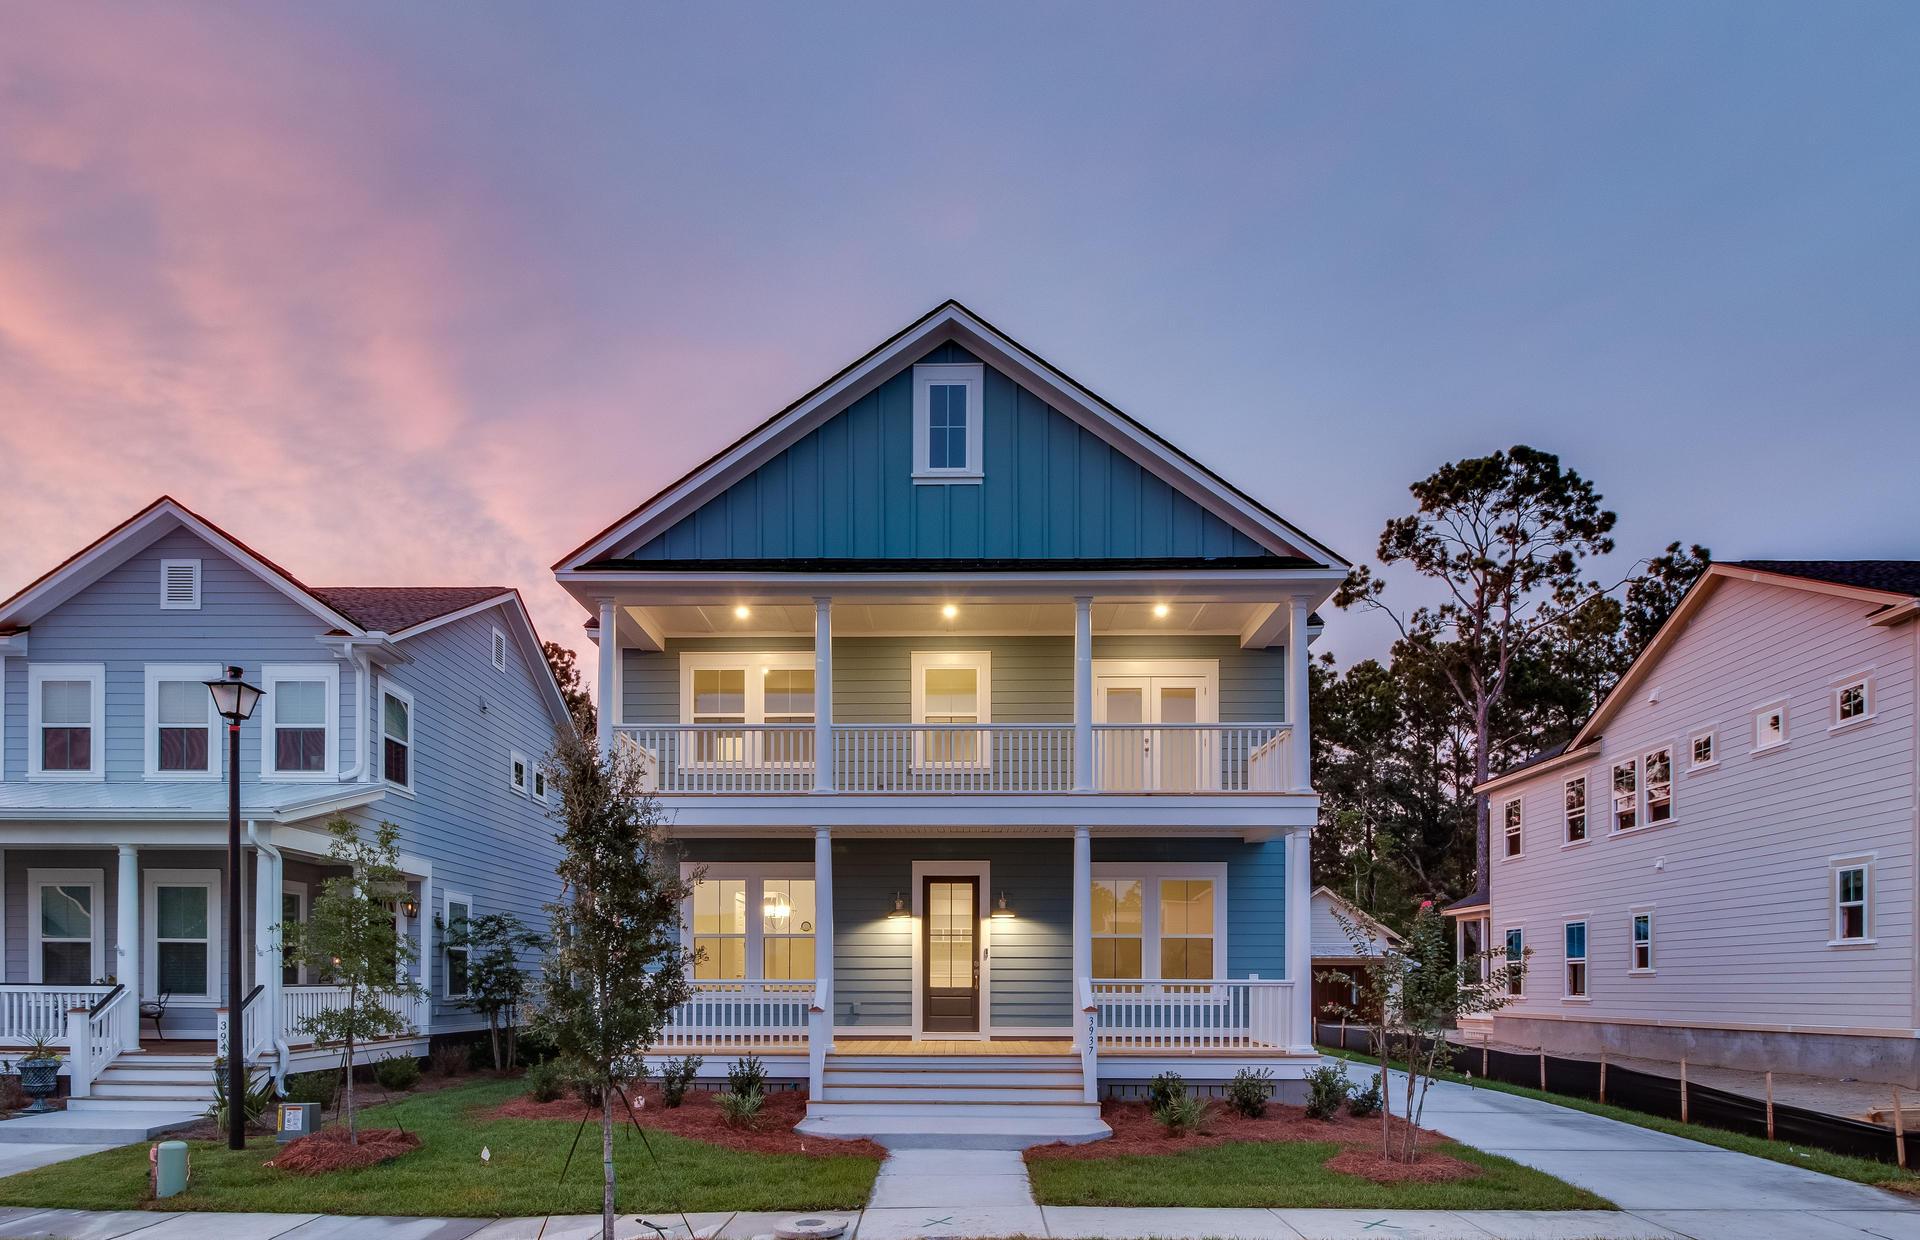 Carolina Park Homes For Sale - 1792 Agate Bay, Mount Pleasant, SC - 1